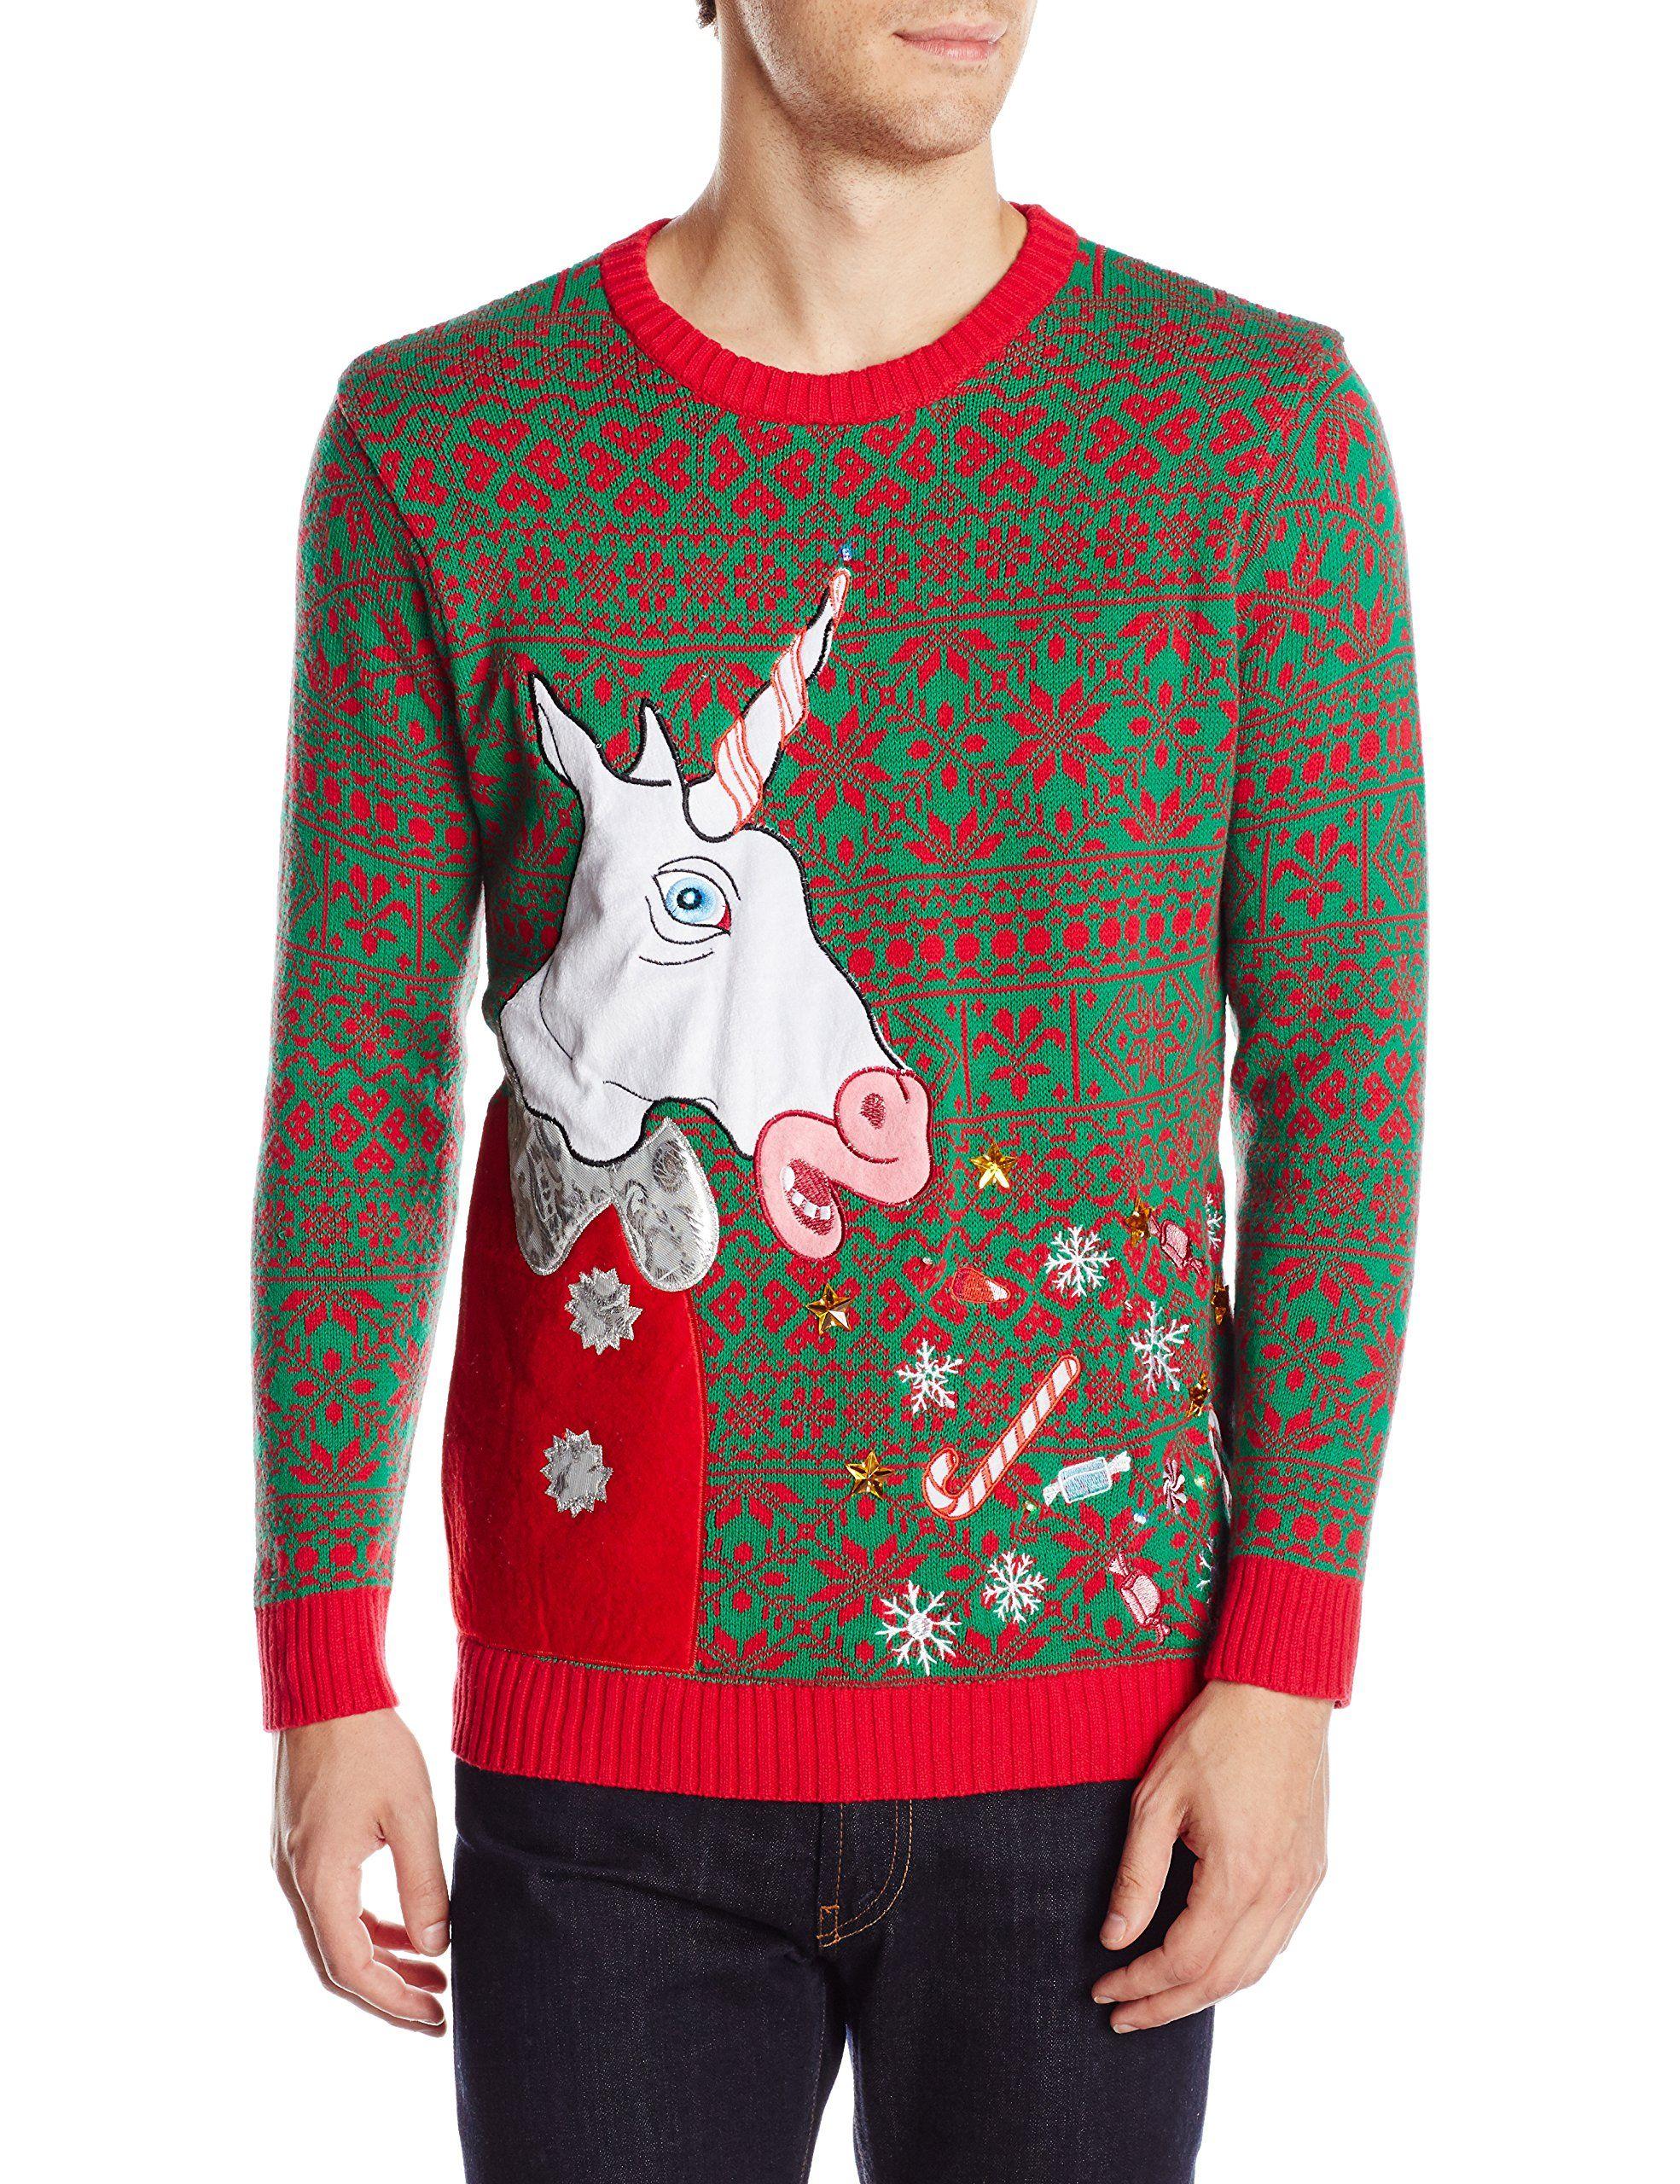 Blizzard Bay Womens Ugly Christmas Unicorn Sweater